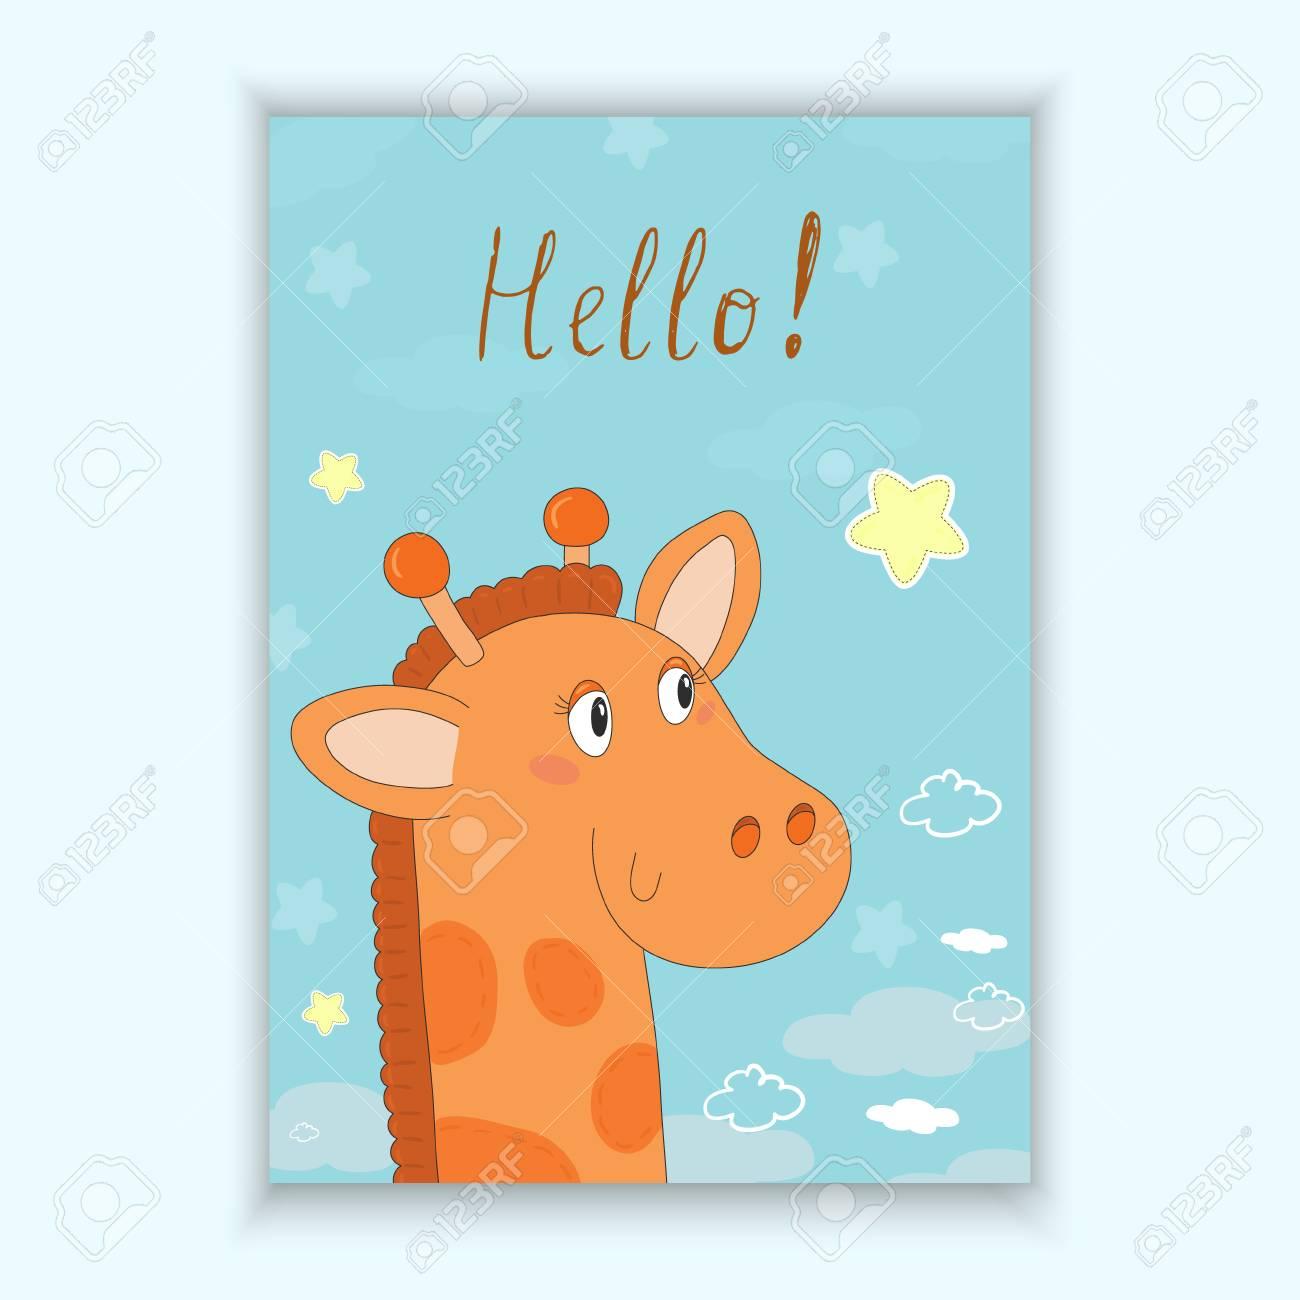 Cute Hand Drawn Card With Giraffe Printable Template Royalty Free